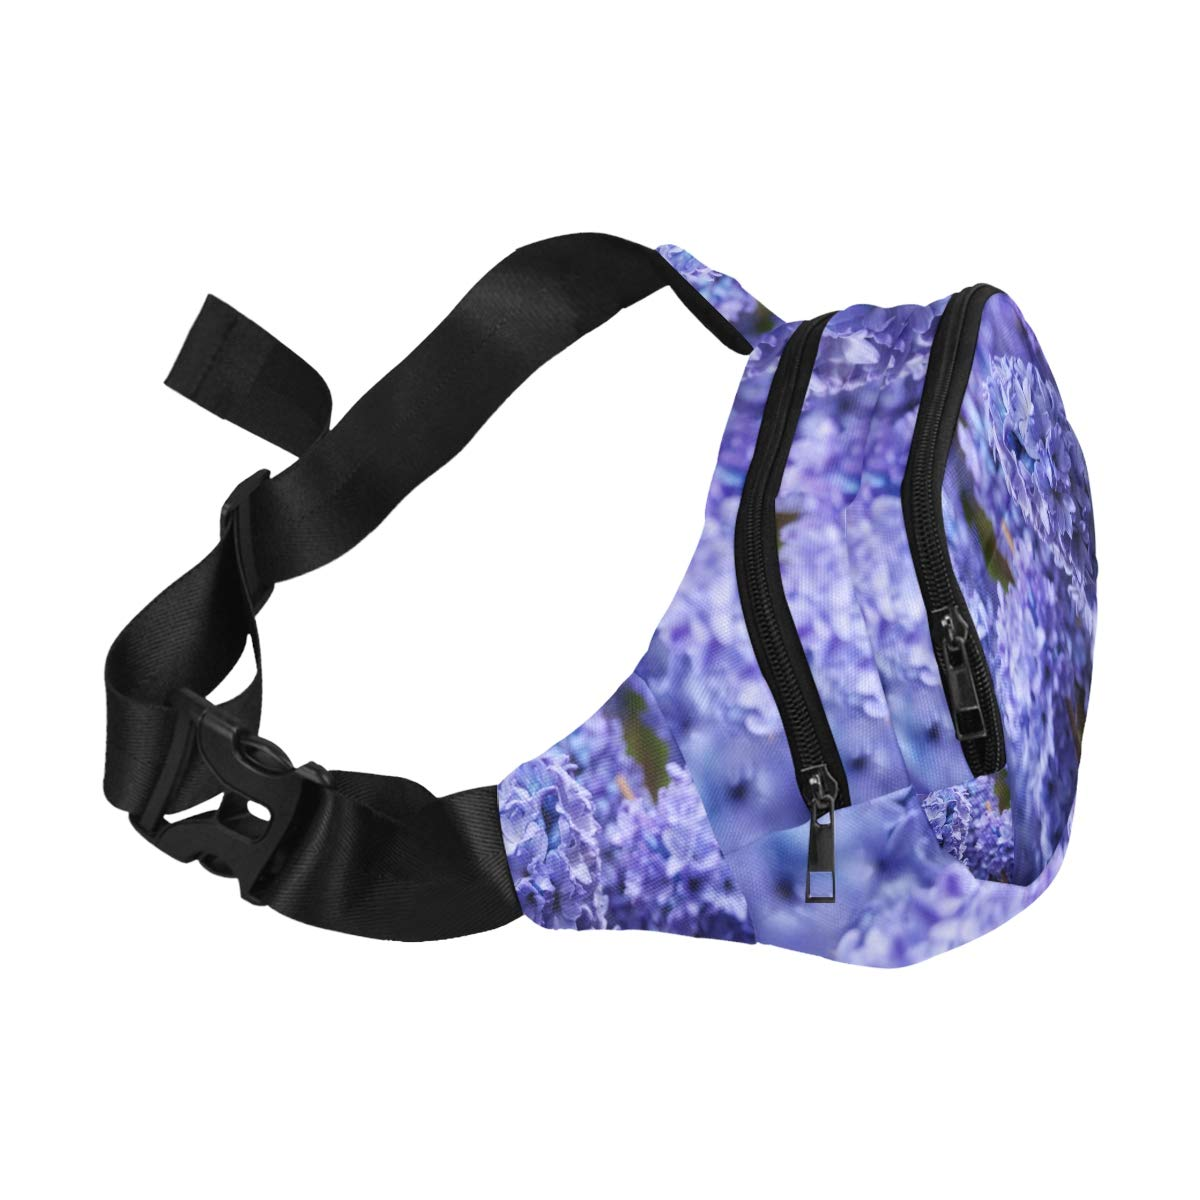 Beautiful Multi-colored Hyacinths Fenny Packs Waist Bags Adjustable Belt Waterproof Nylon Travel Running Sport Vacation Party For Men Women Boys Girls Kids